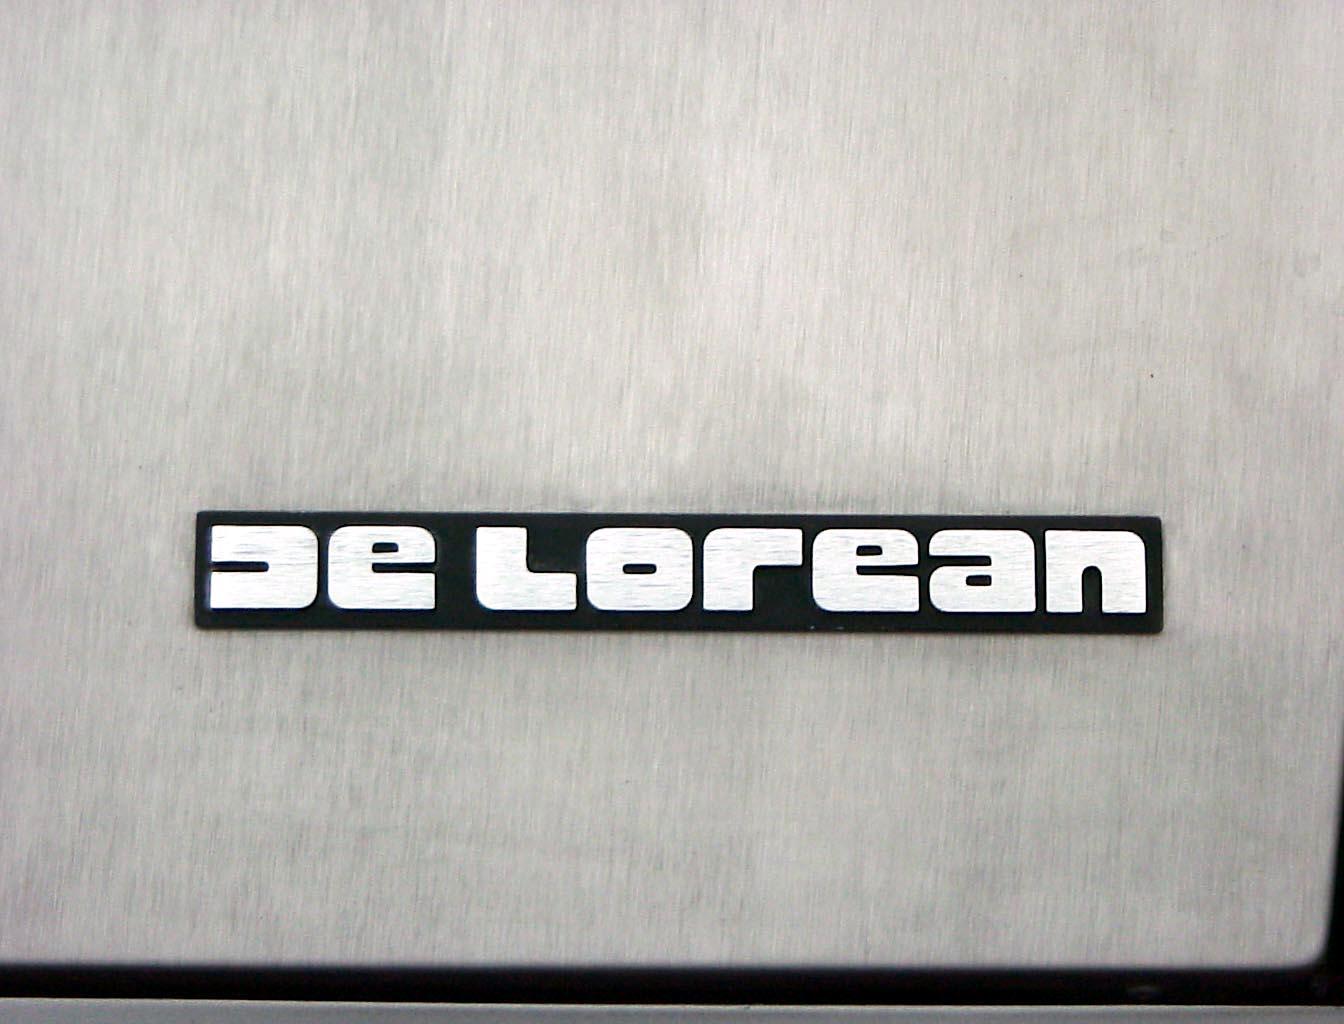 DeLorean logo wallpapers HD